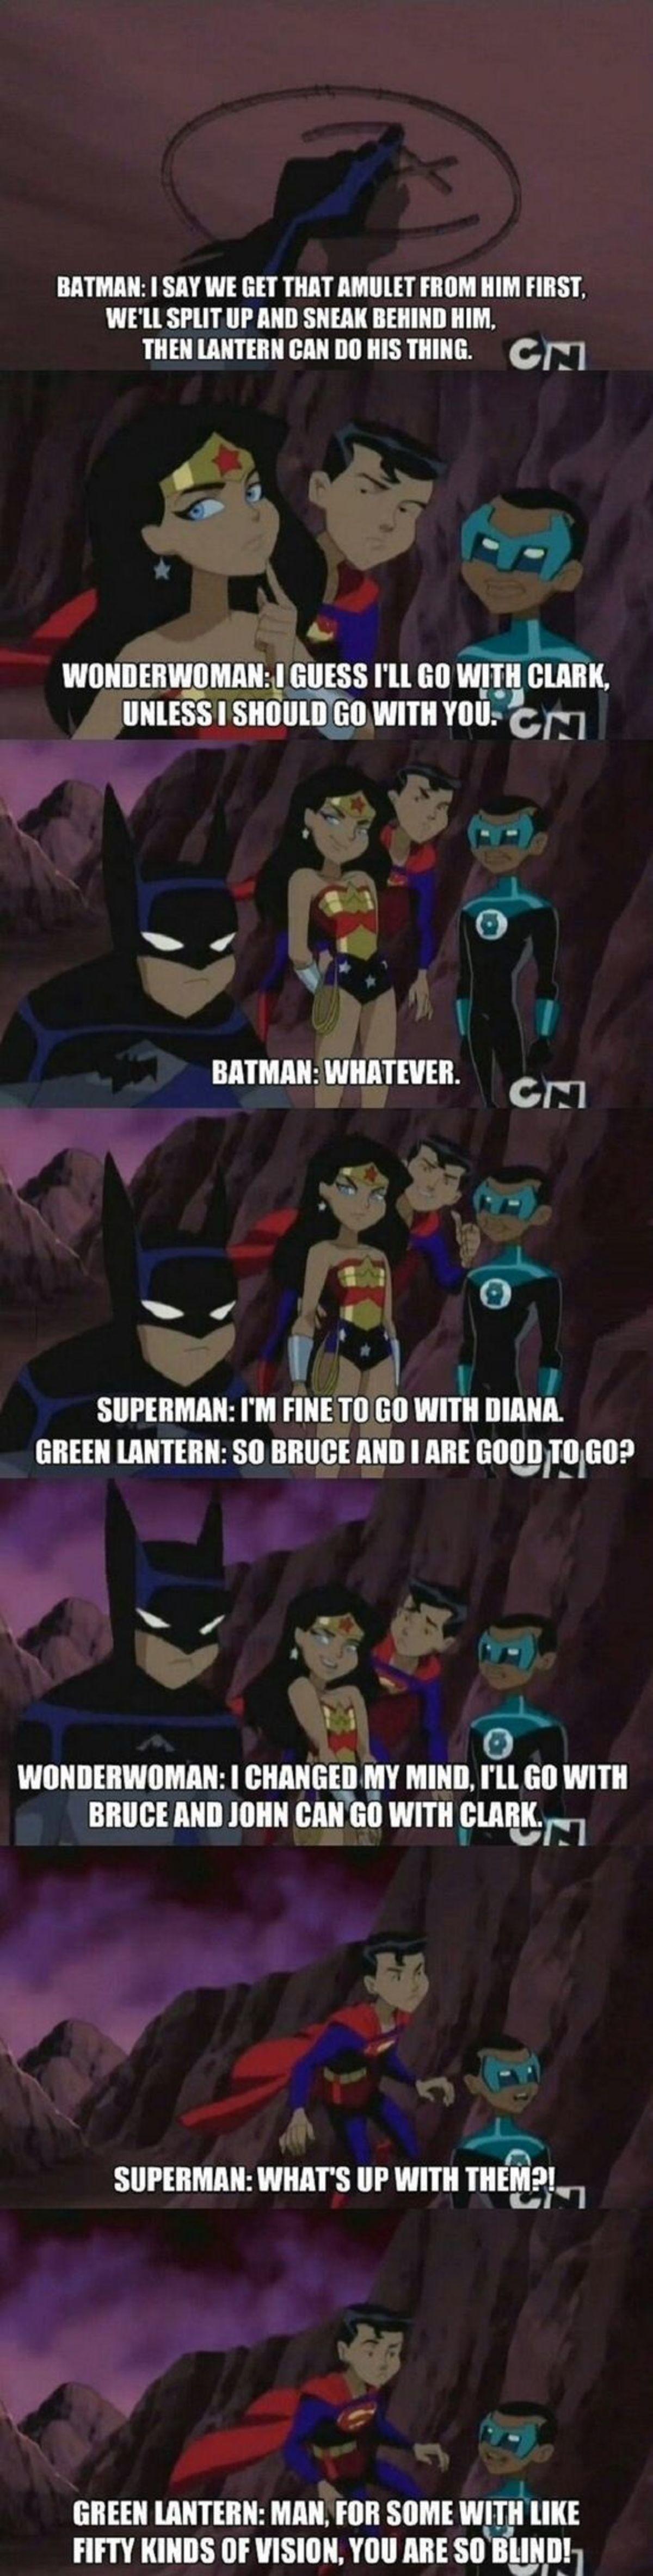 Wonder Woman. .. wonder loli is the worlds greatest temptress Wonder Woman wonder loli is the worlds greatest temptress